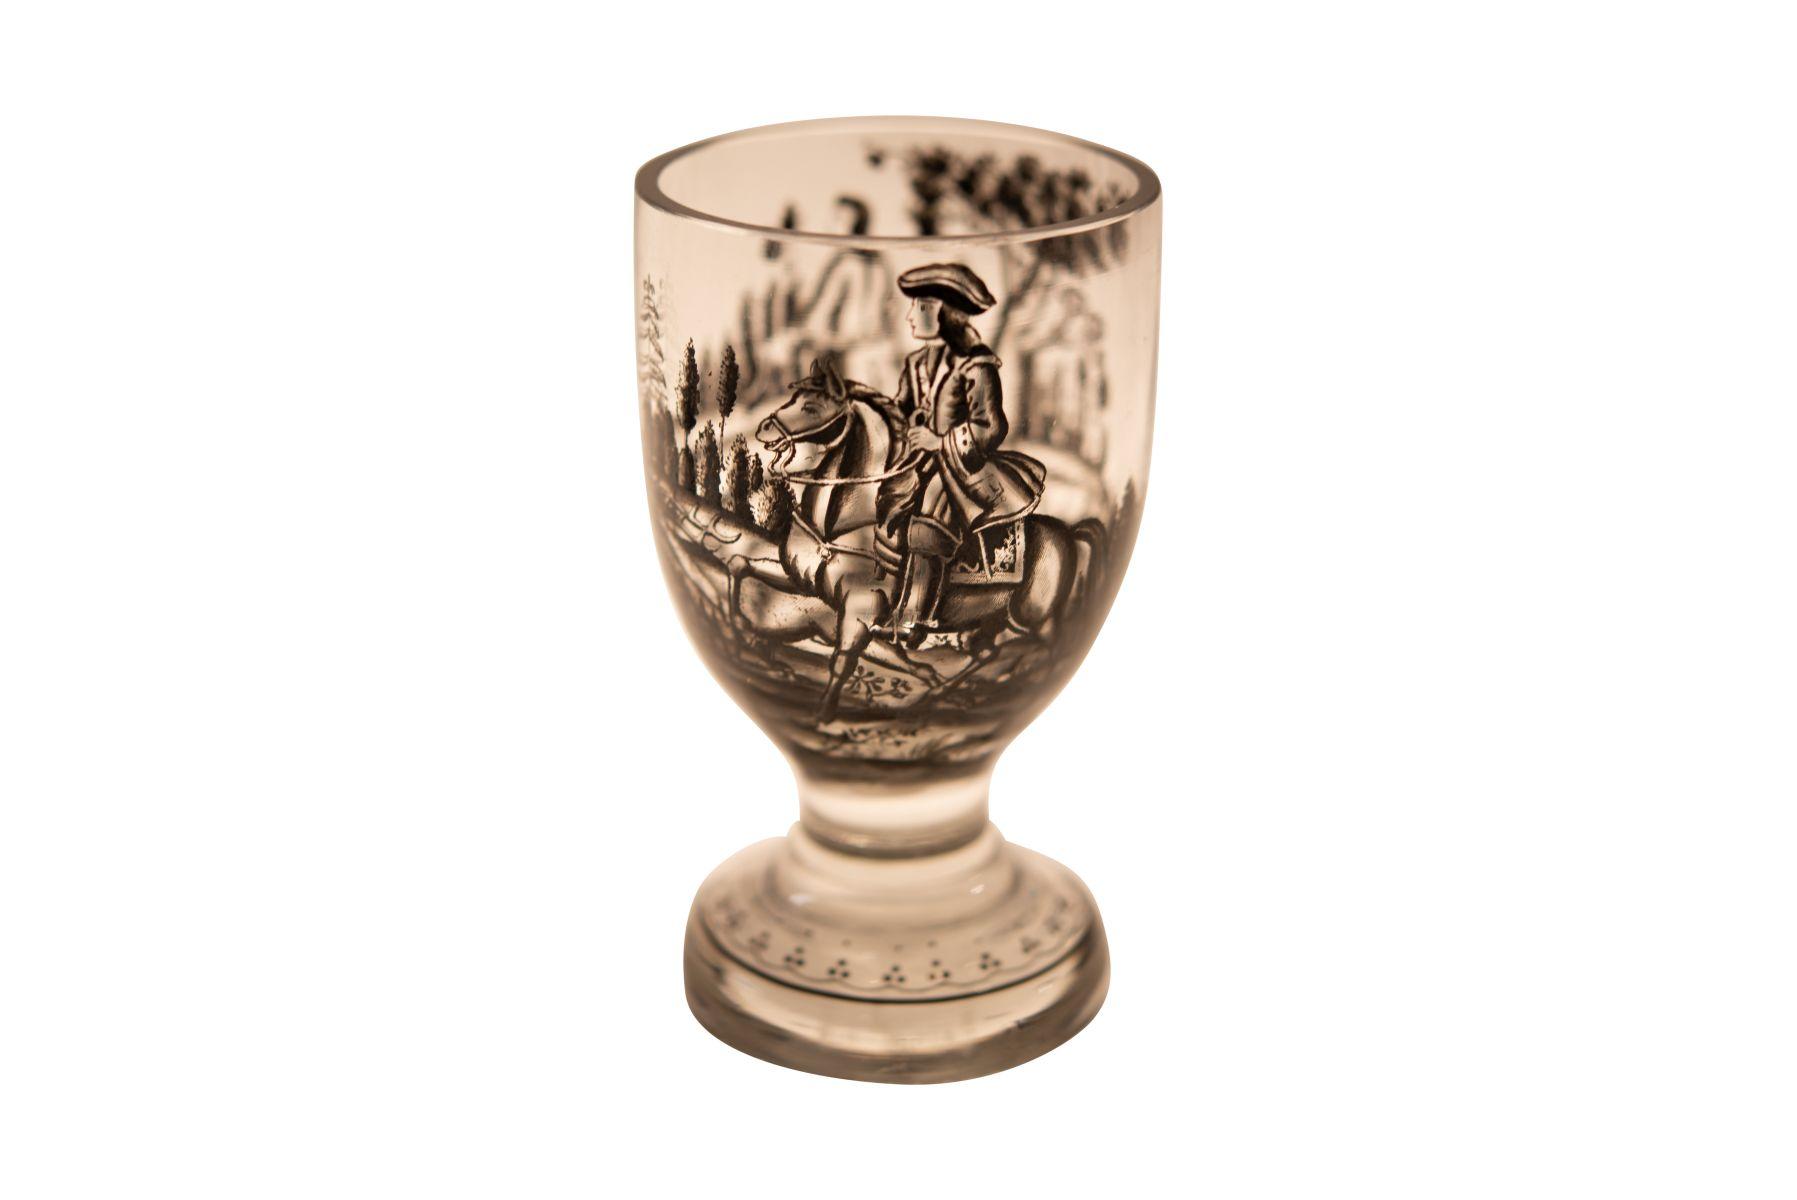 #182 Drinking Goblet Made of Glass, Bohemia, Approx. 1750   Trinkpokal aus Glas, Böhmen, ca. 1750 Image